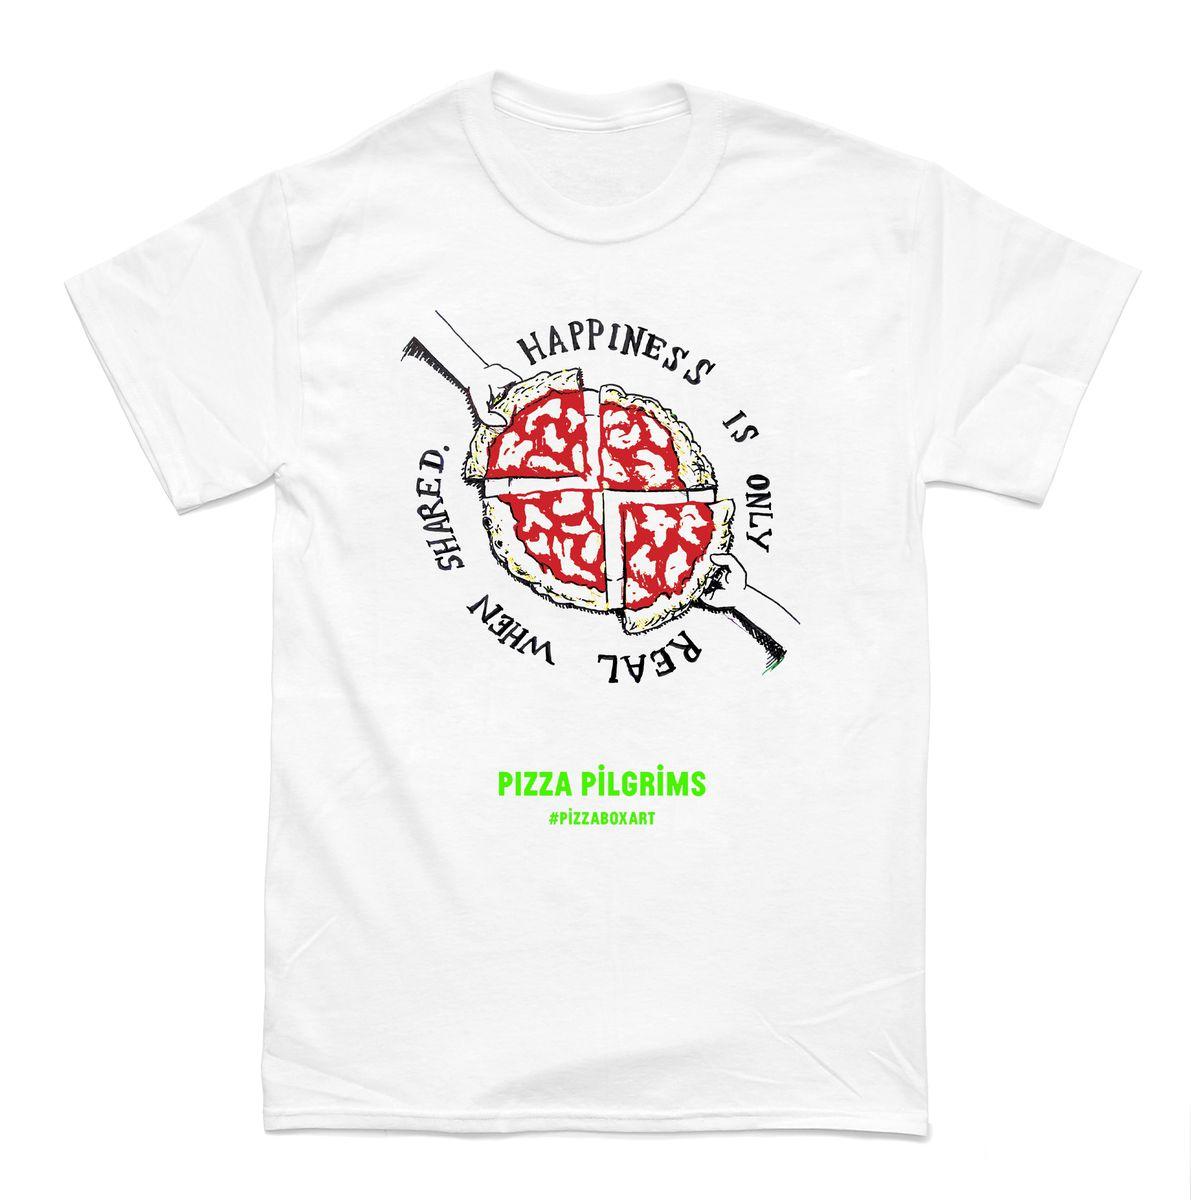 Pizza Pilgrims pizza t-shirt, merch